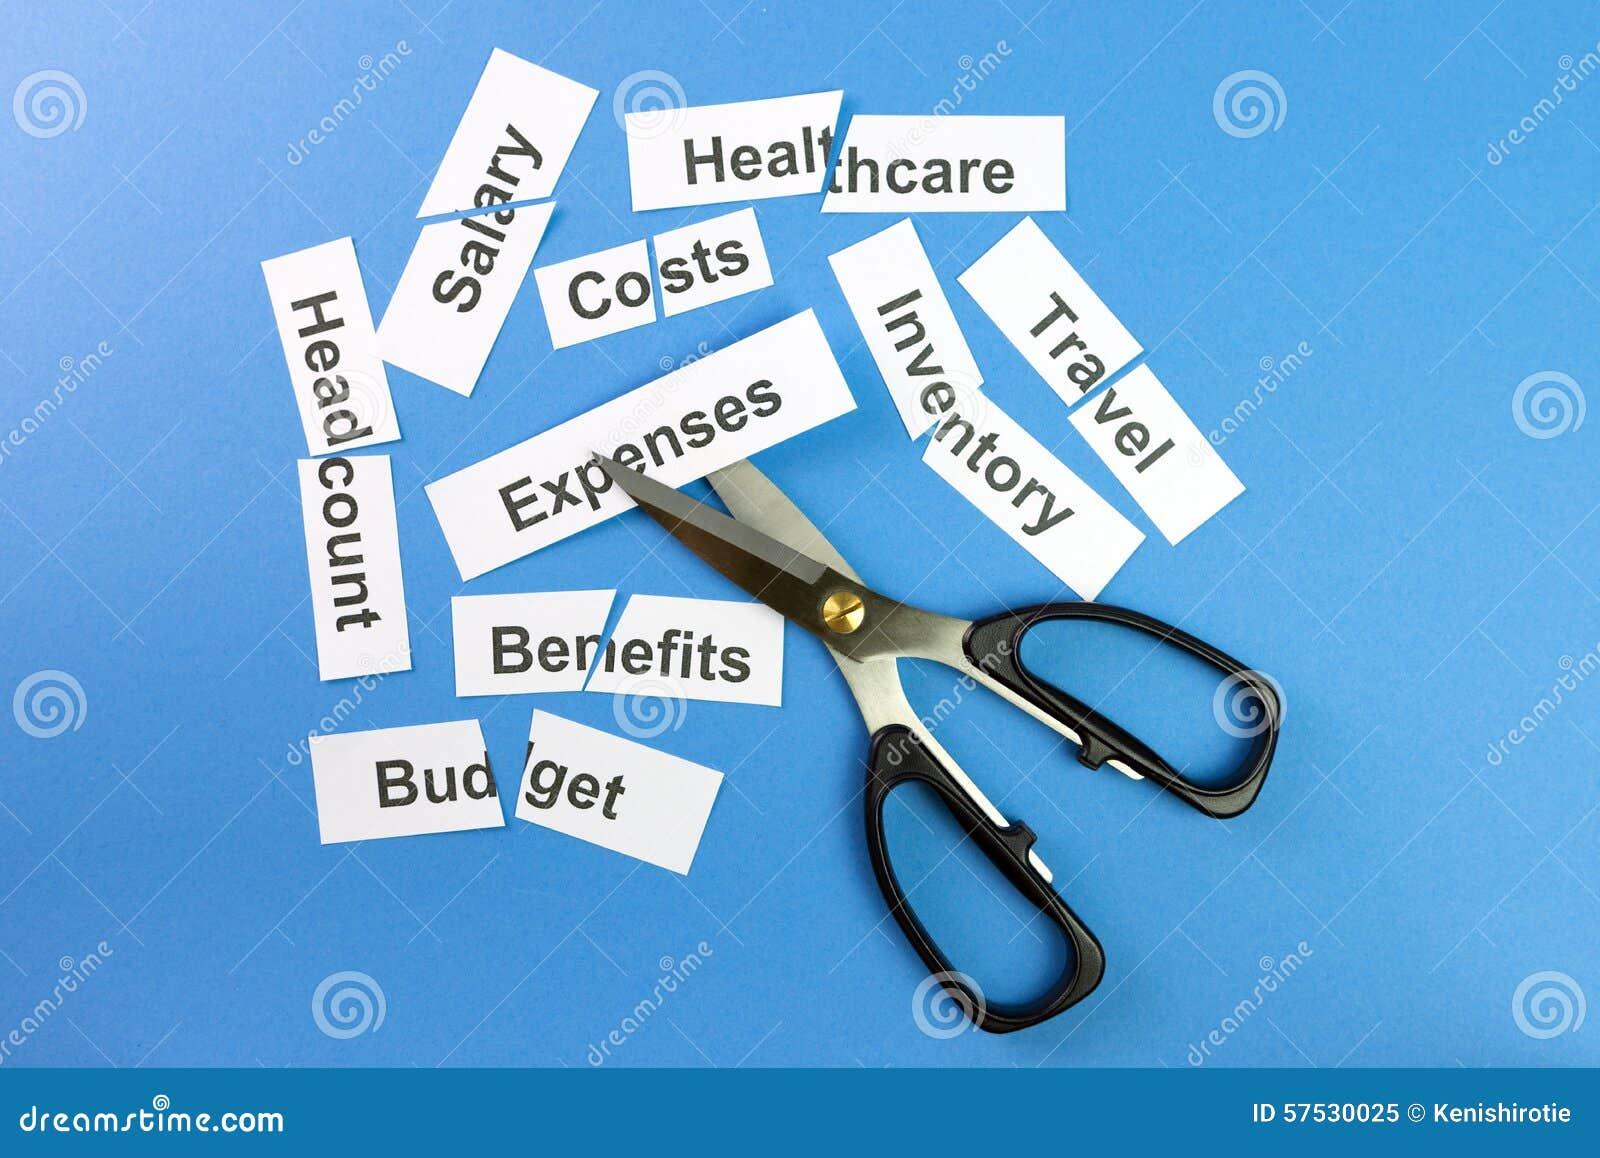 Cost Management & Cost Control Essay